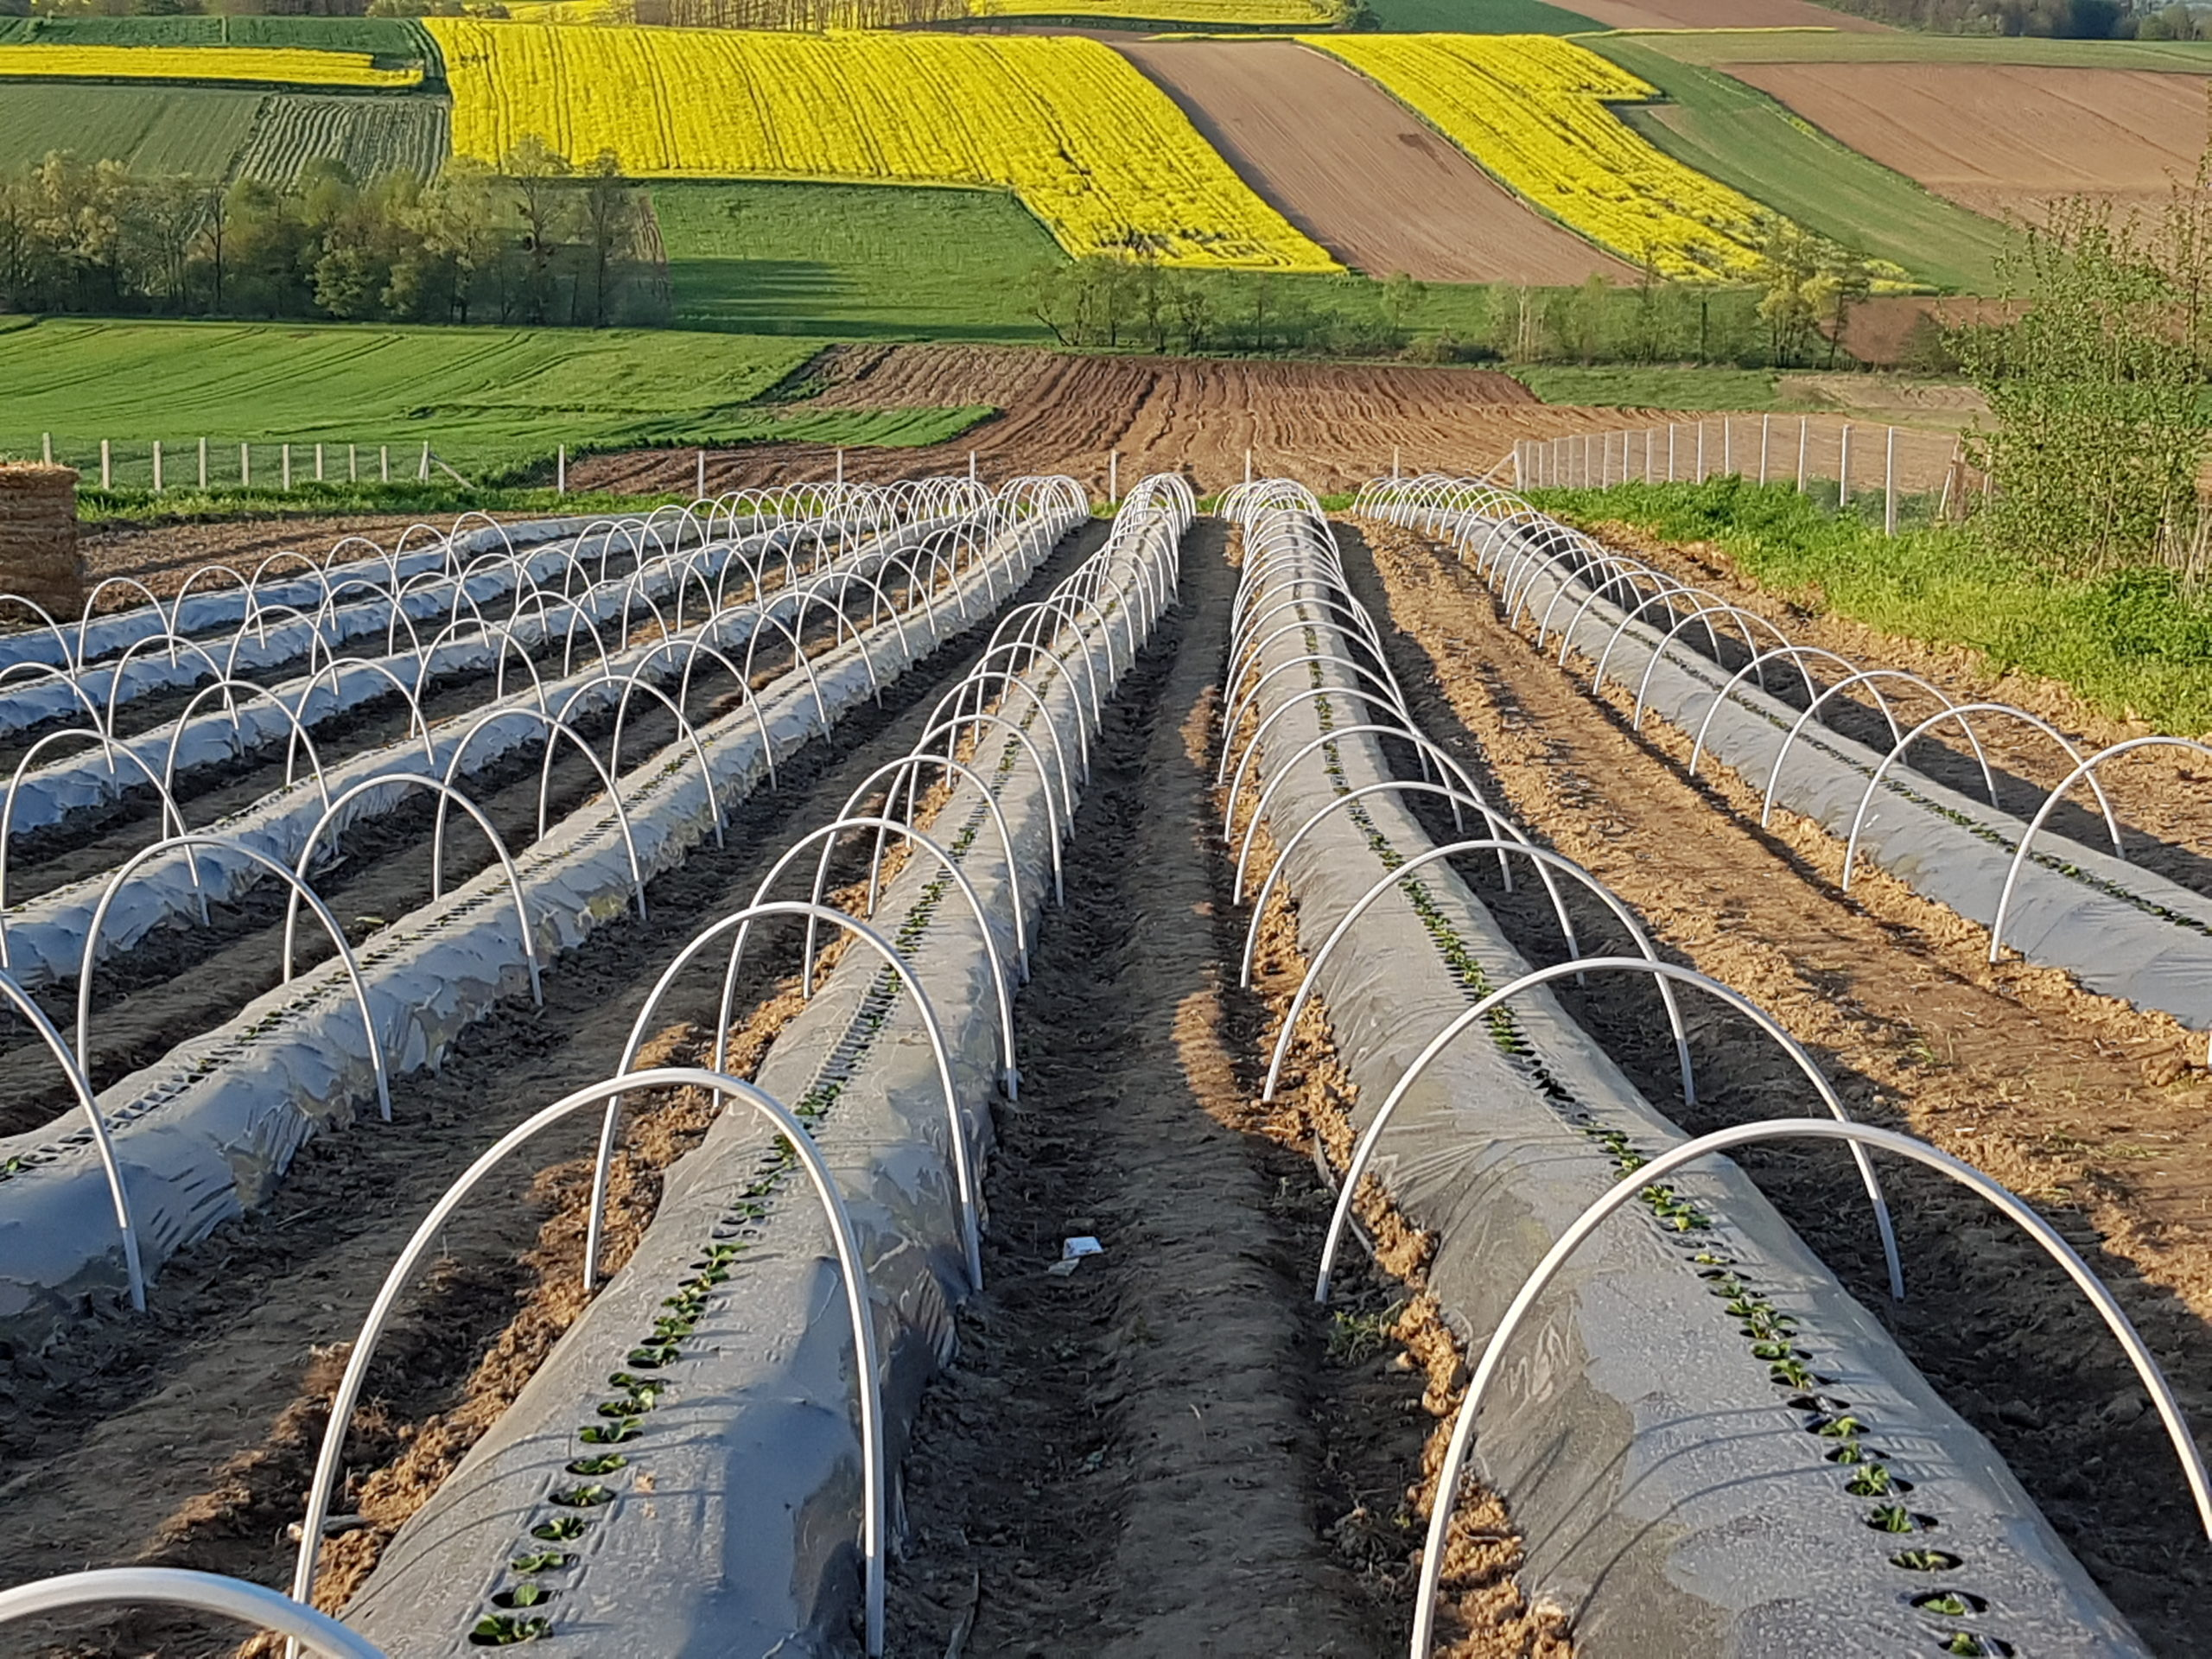 PVC greenhouses